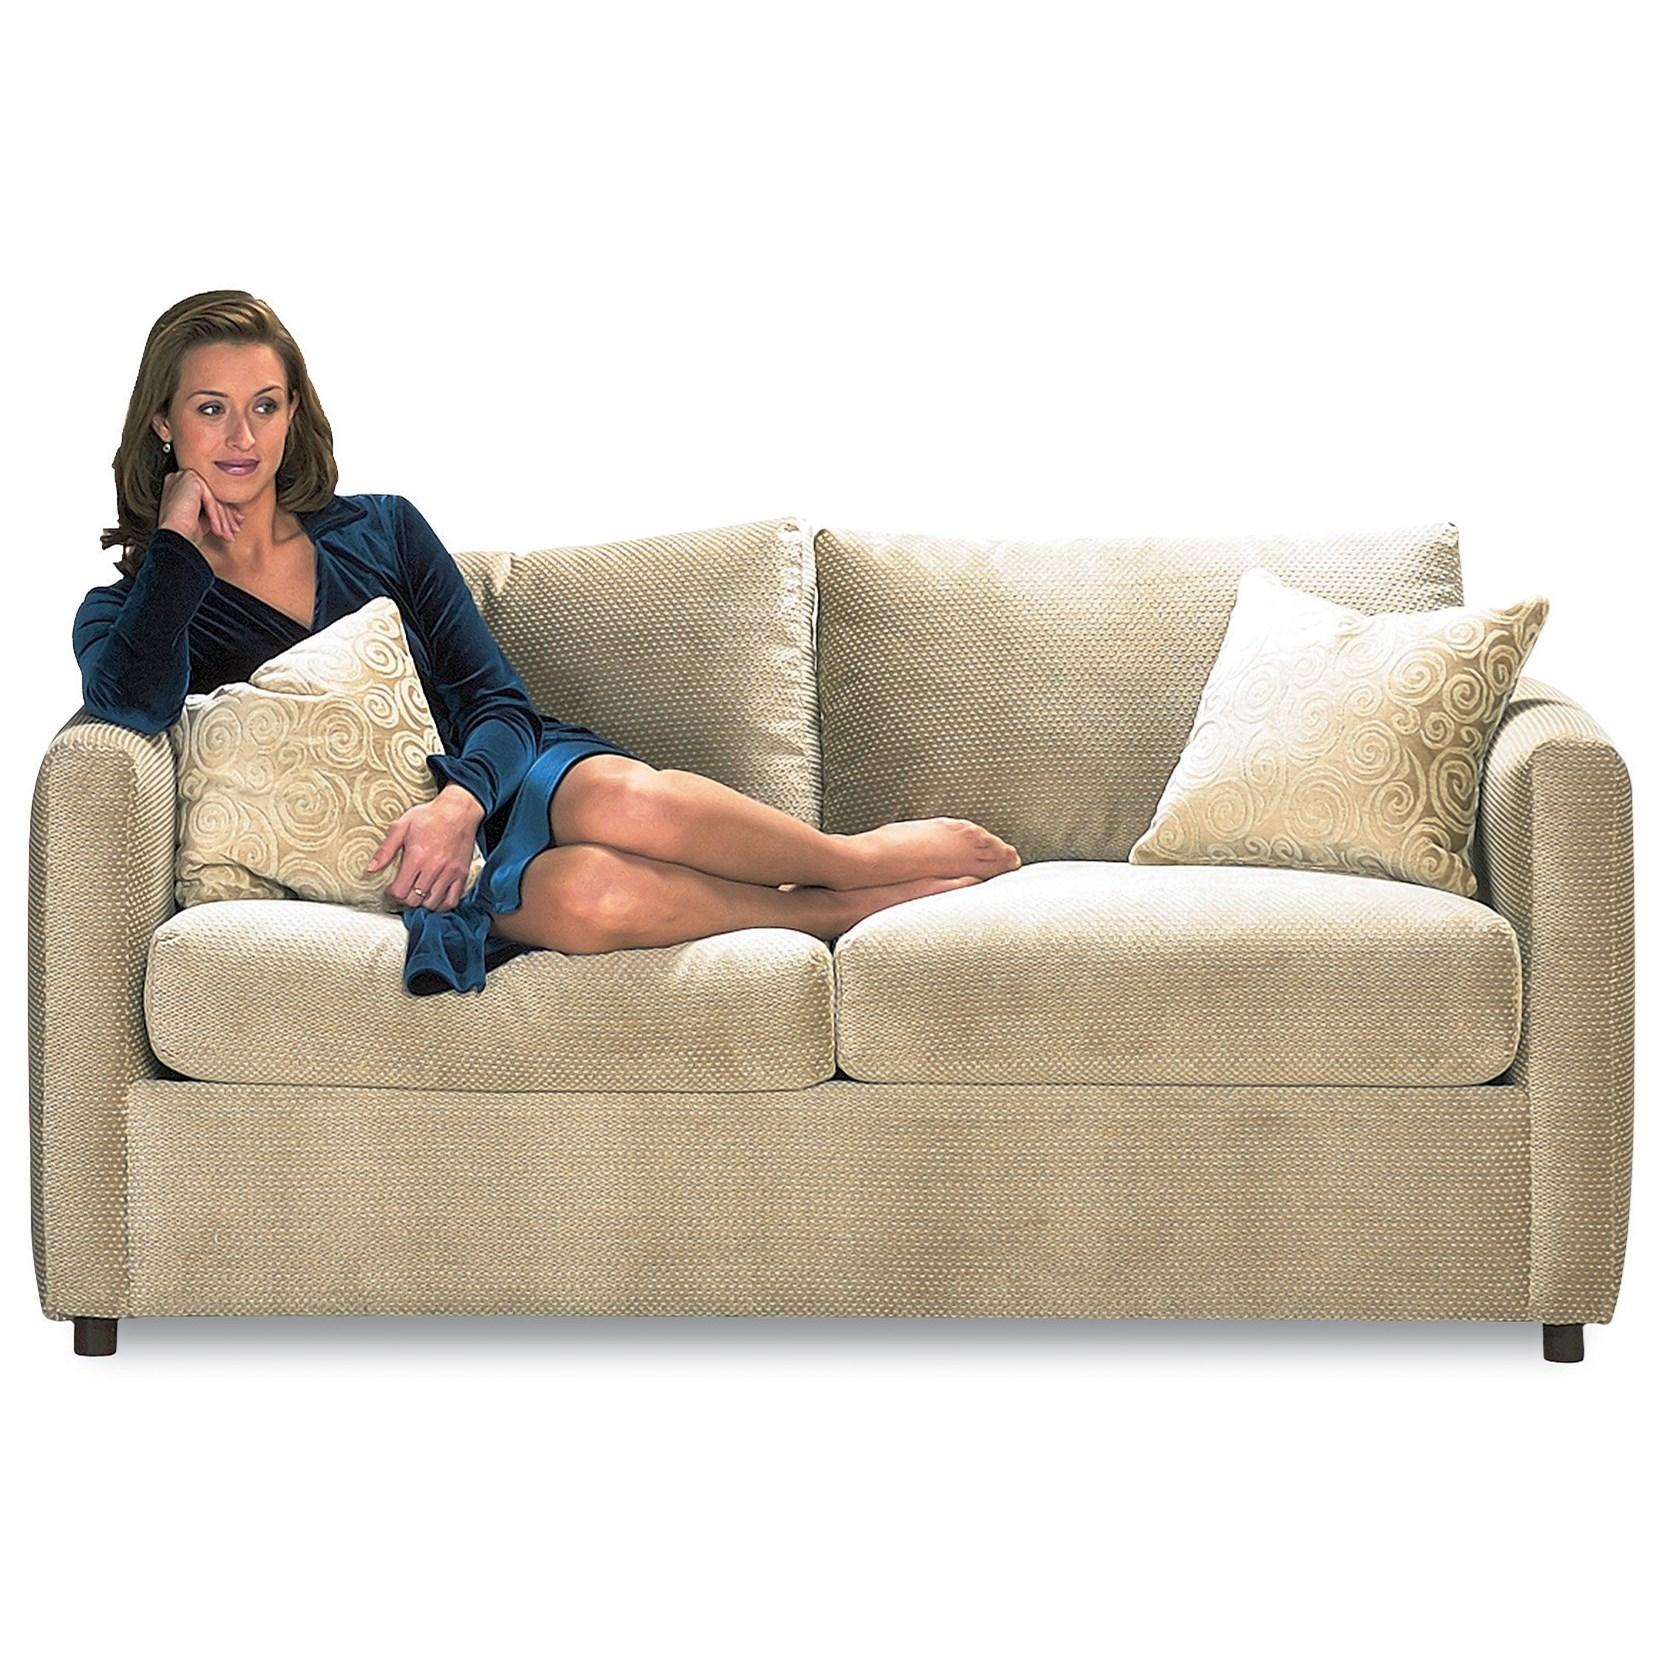 Rowe Stockdale Contemporary Two Cushion Full Sleeper Sofa